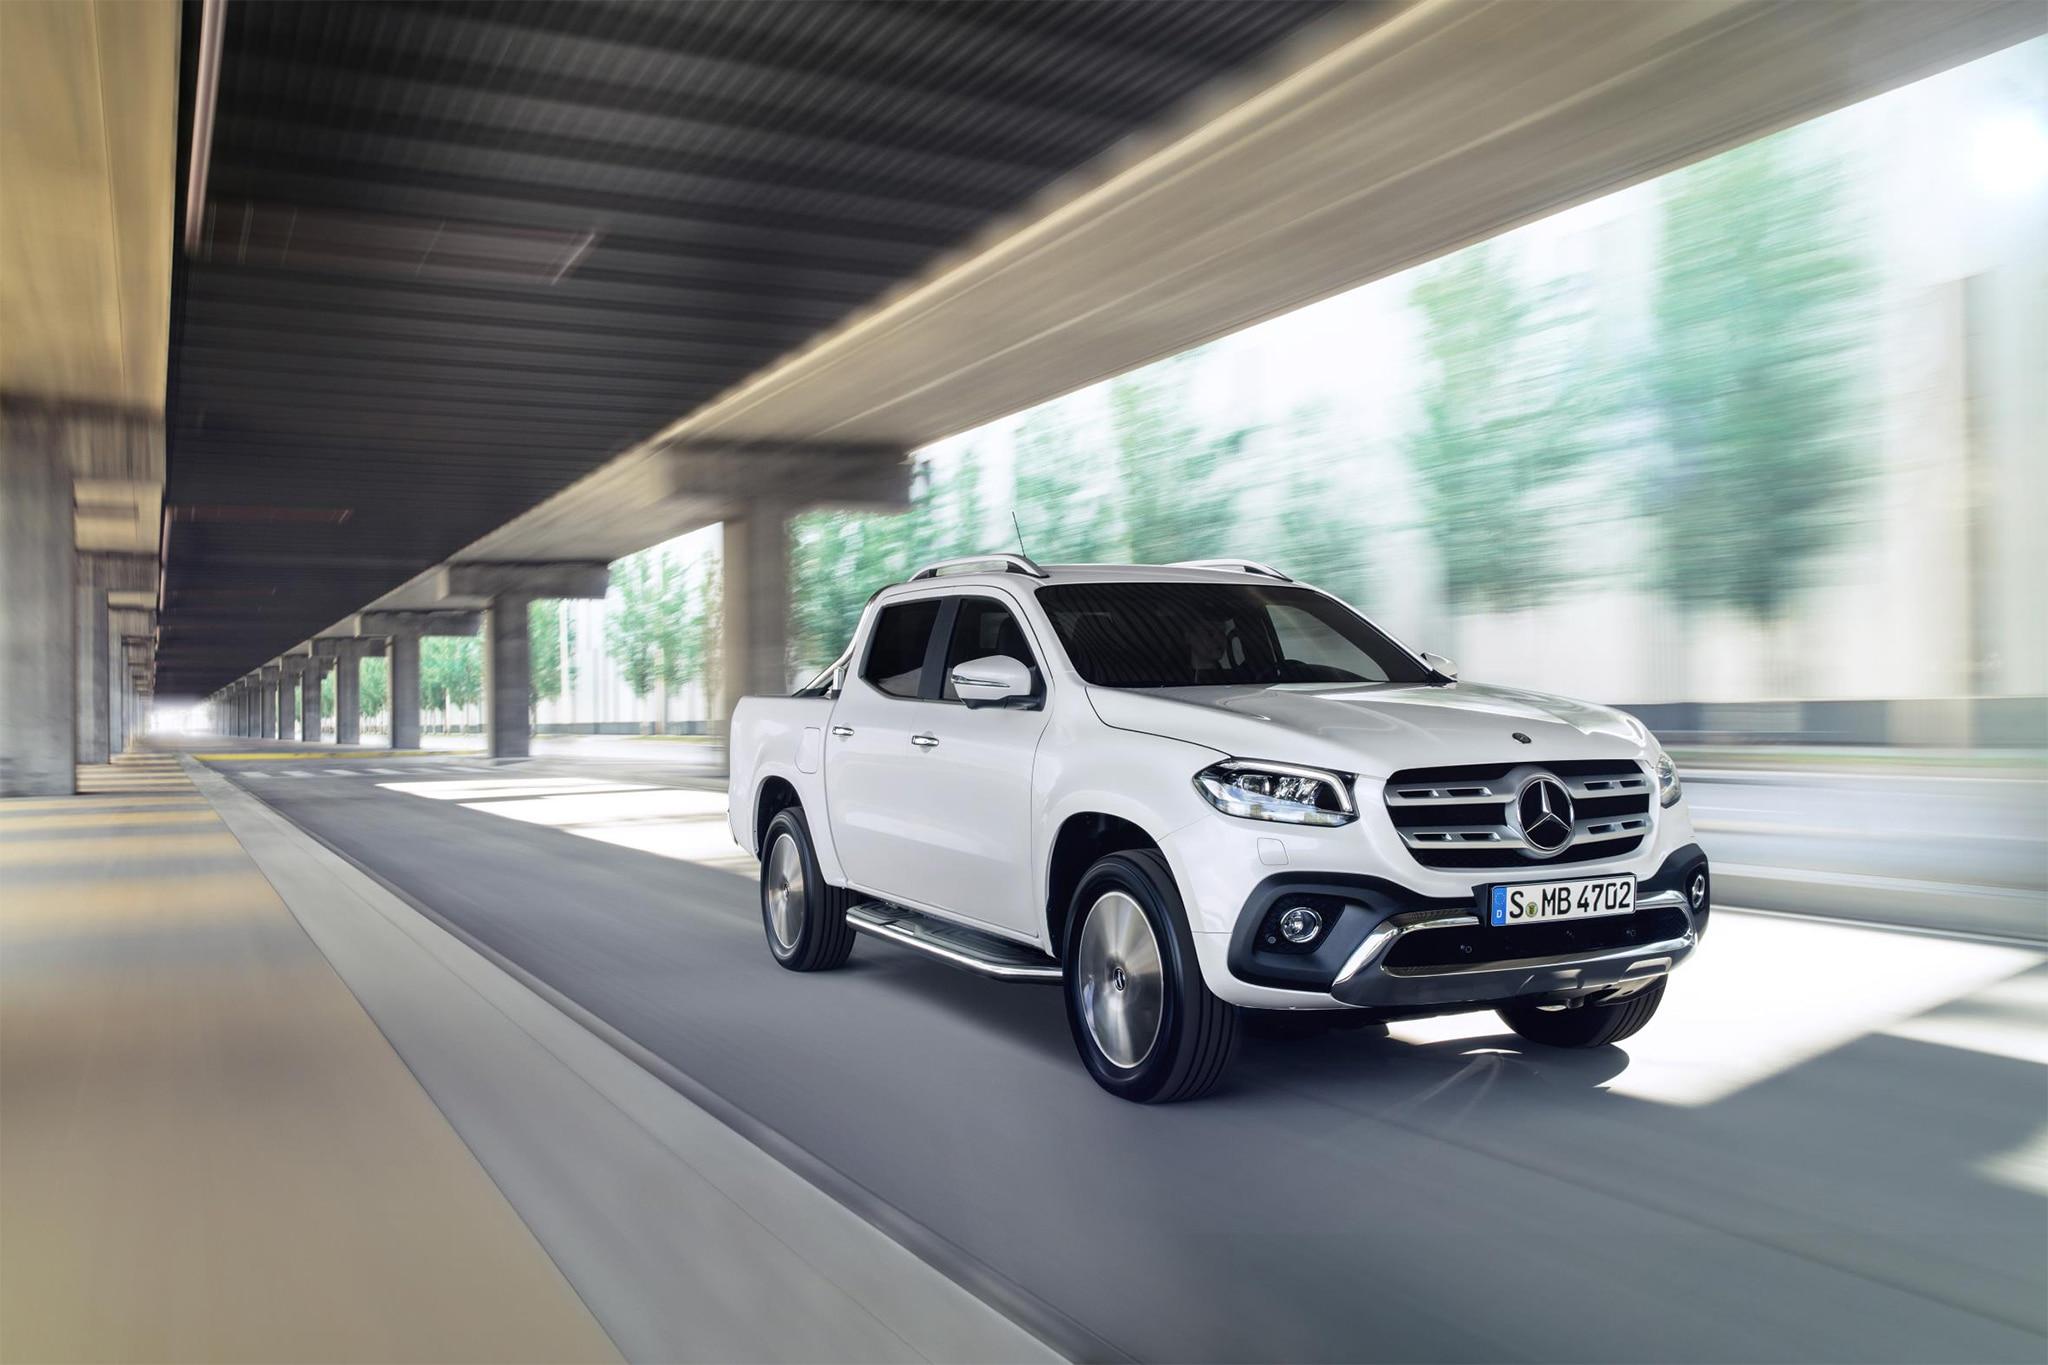 https://st.automobilemag.com/uploads/sites/11/2017/07/2018-Mercedes-Benz-X-Class-front-three-quarter-in-motion-03.jpg